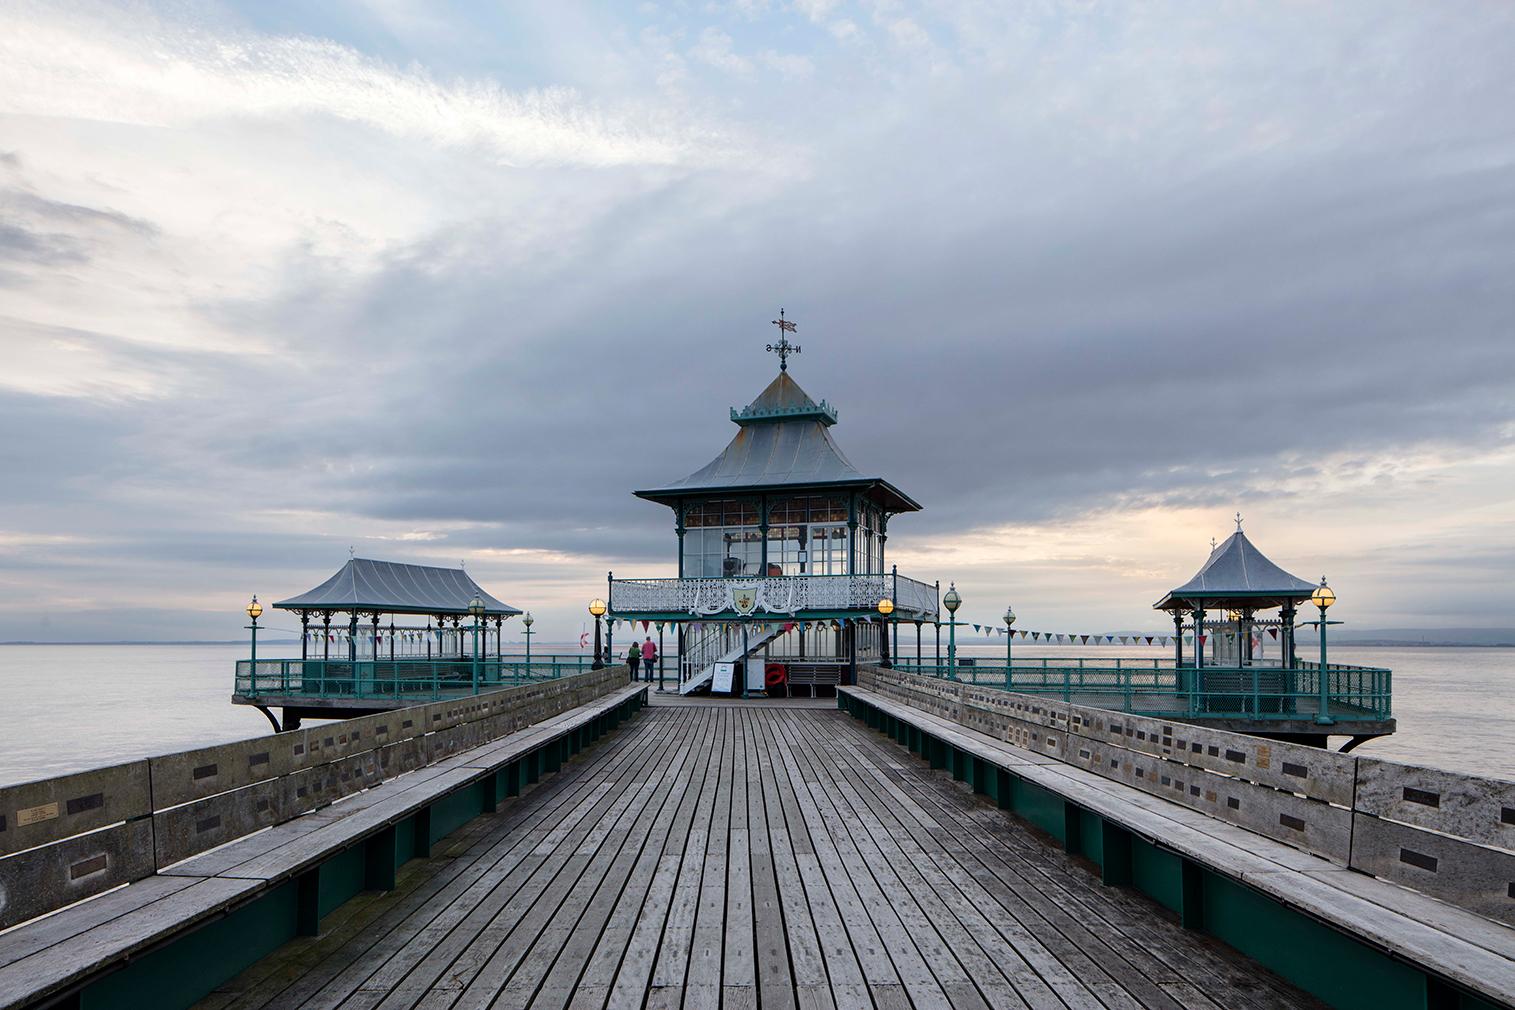 Seaside shelters series by Will Scott